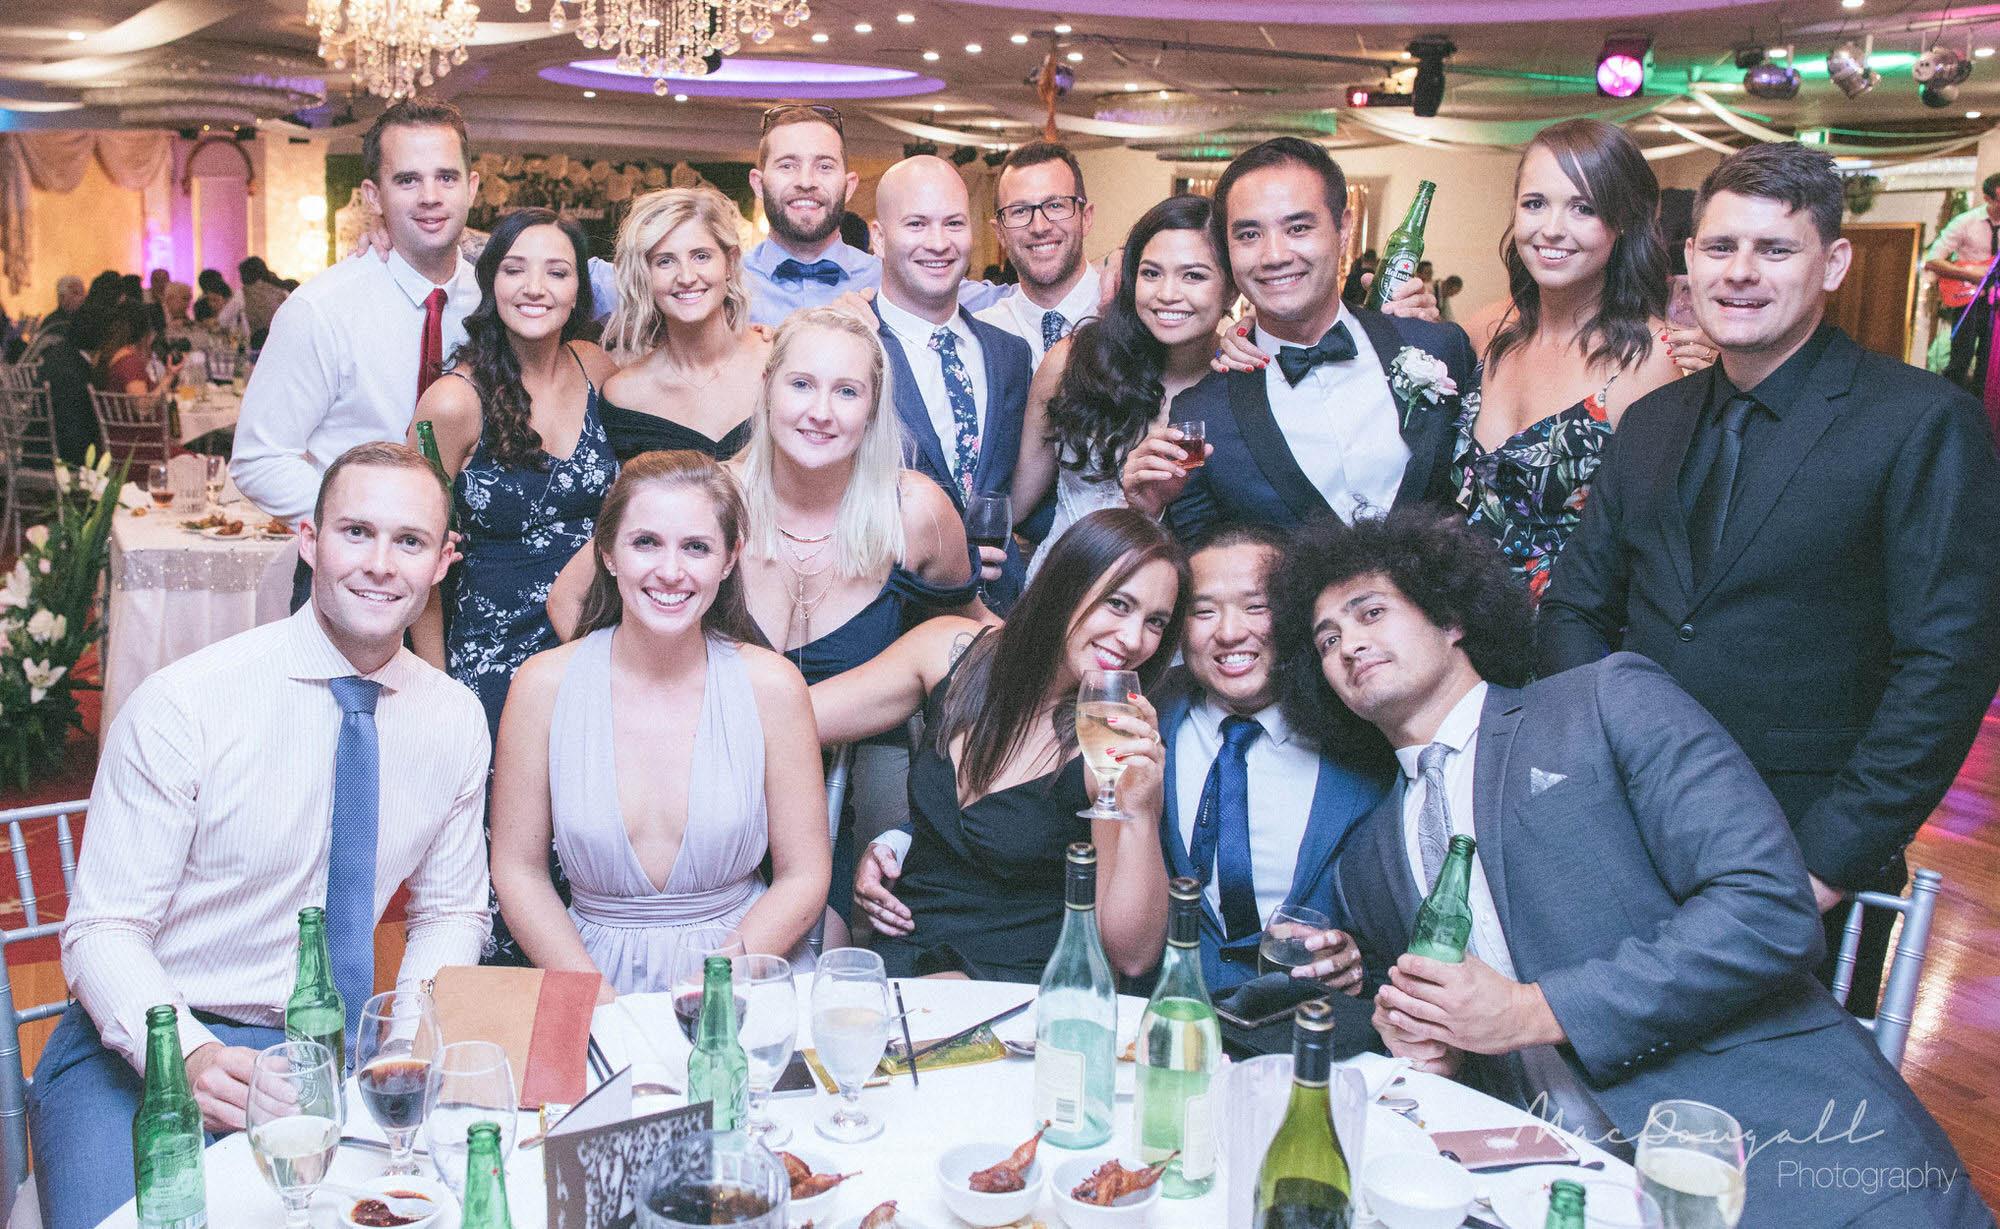 MacDougall-Photography-Sydney-Wedding-Photographers-2.jpg